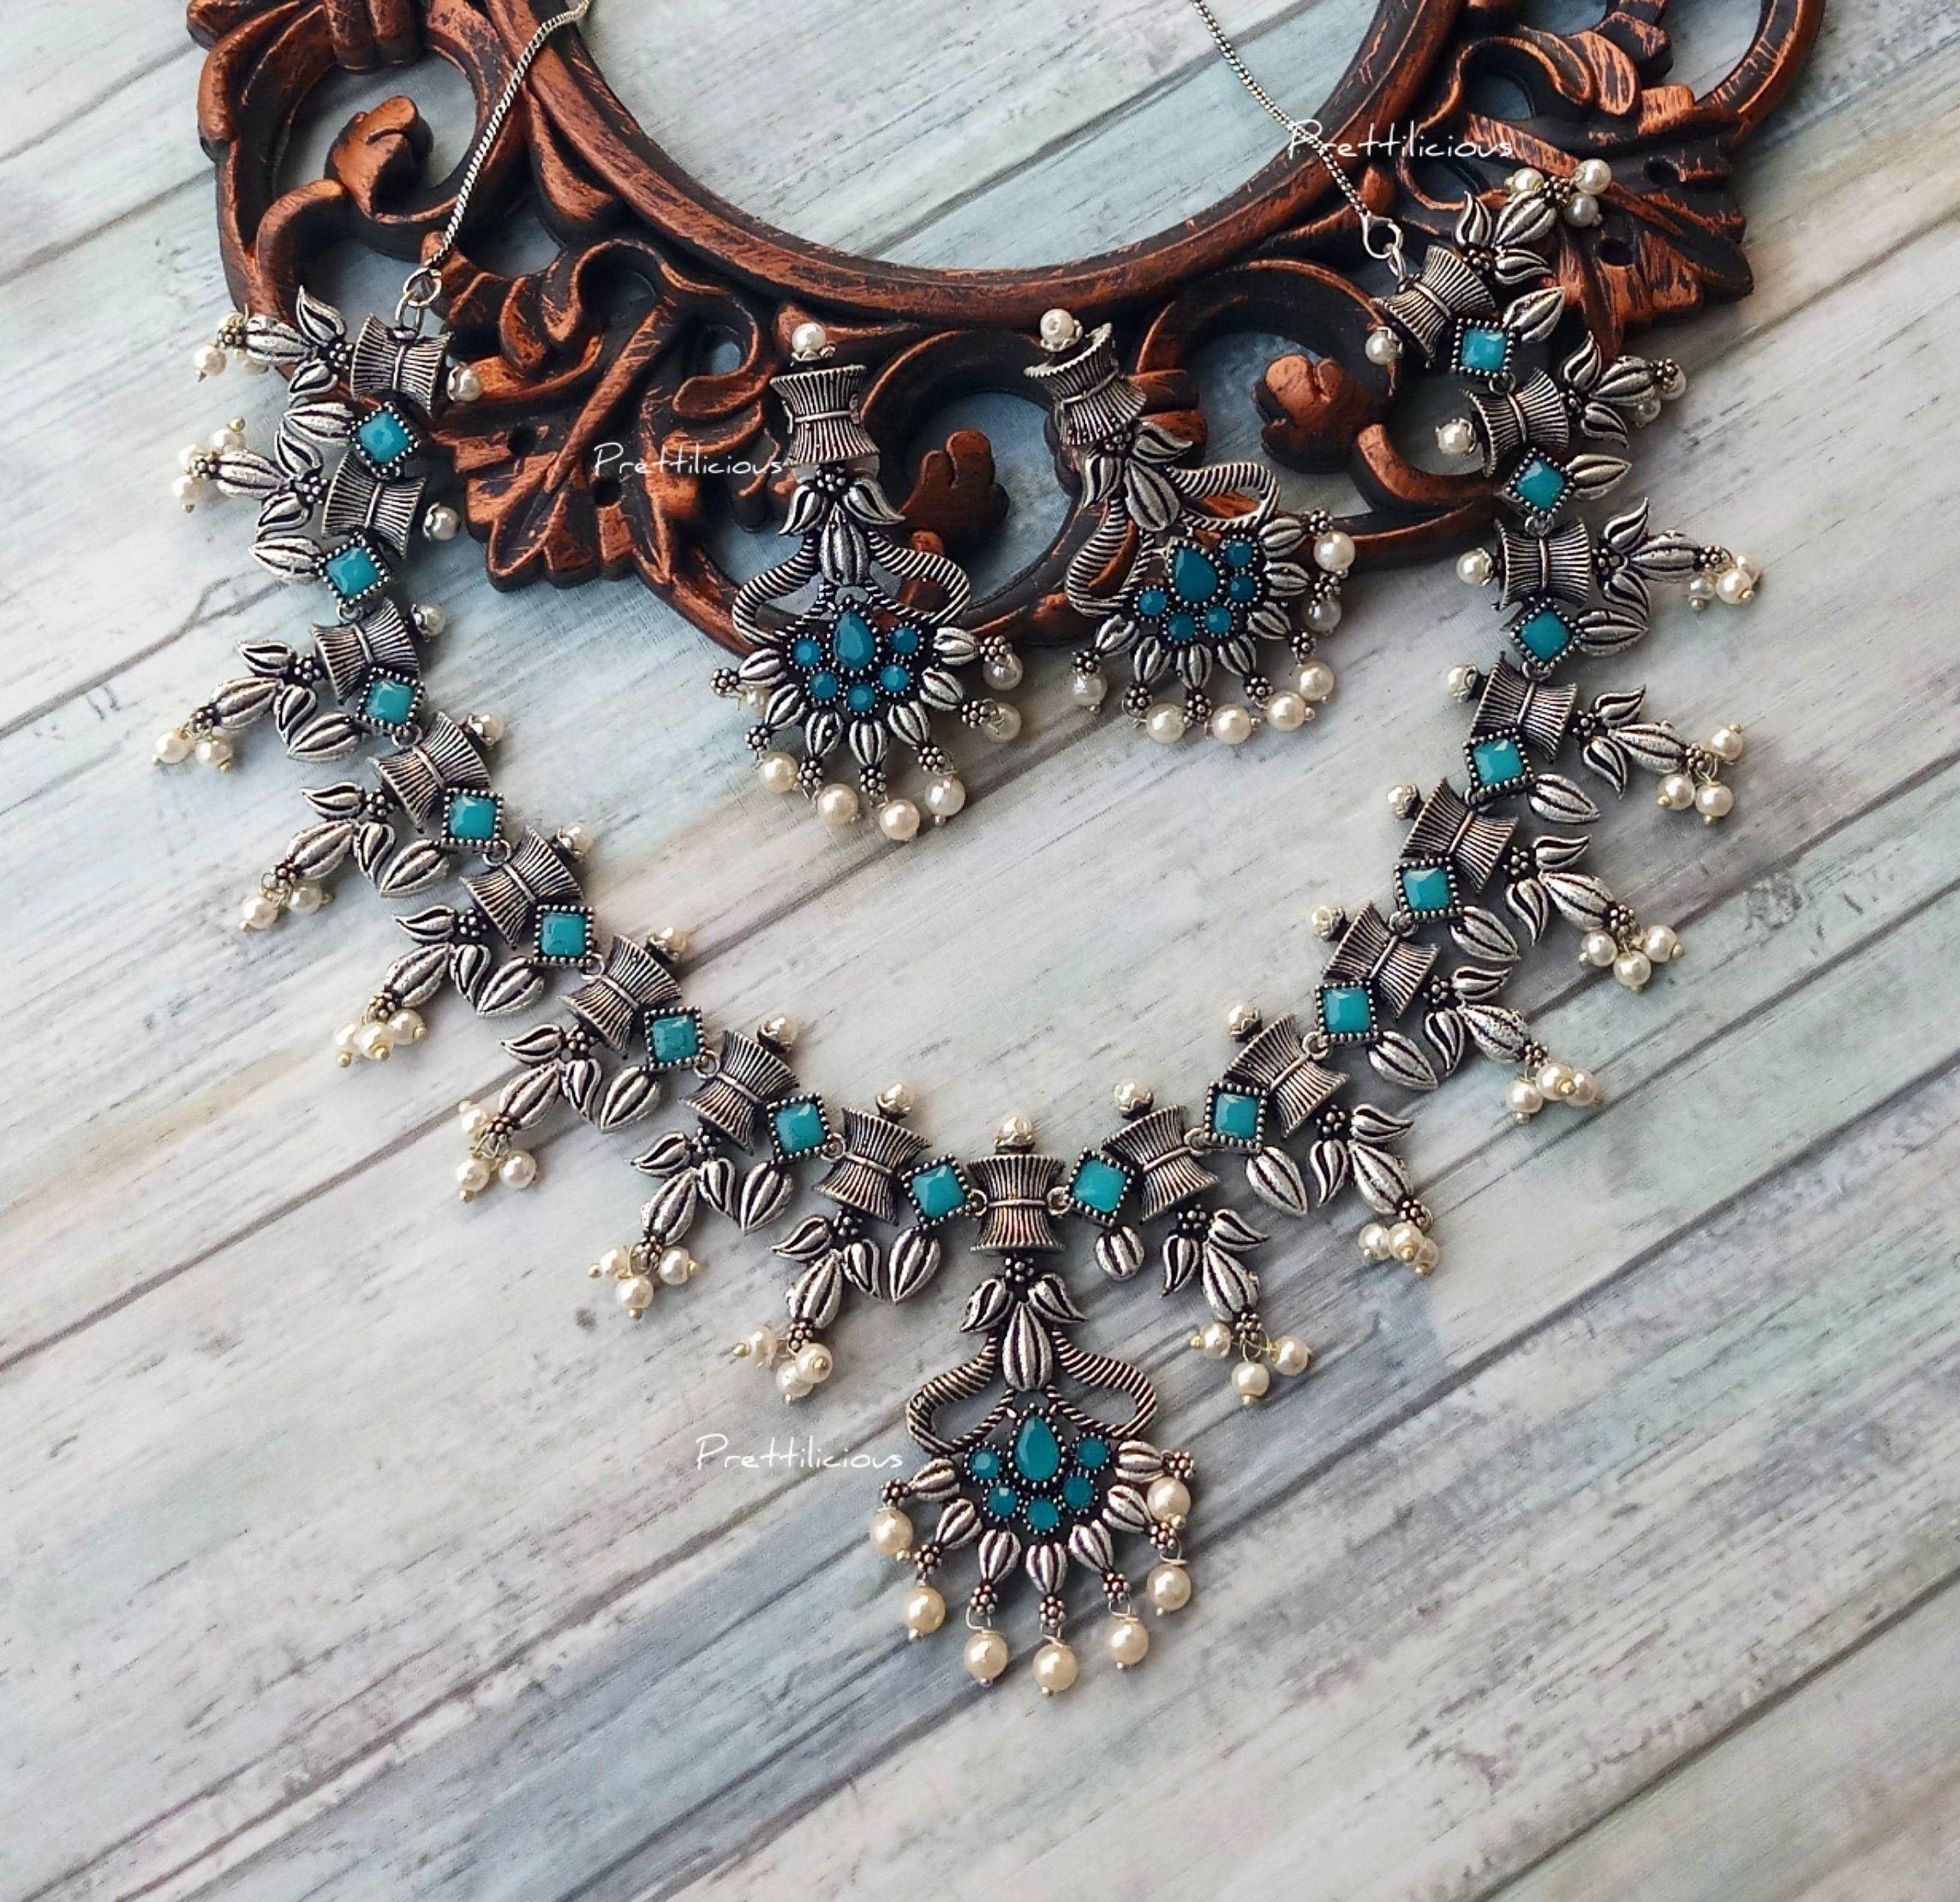 necklace and earrings combo set earrings,boho gypsy look Afghani Jewelery stone studded necklace Afghani necklace set